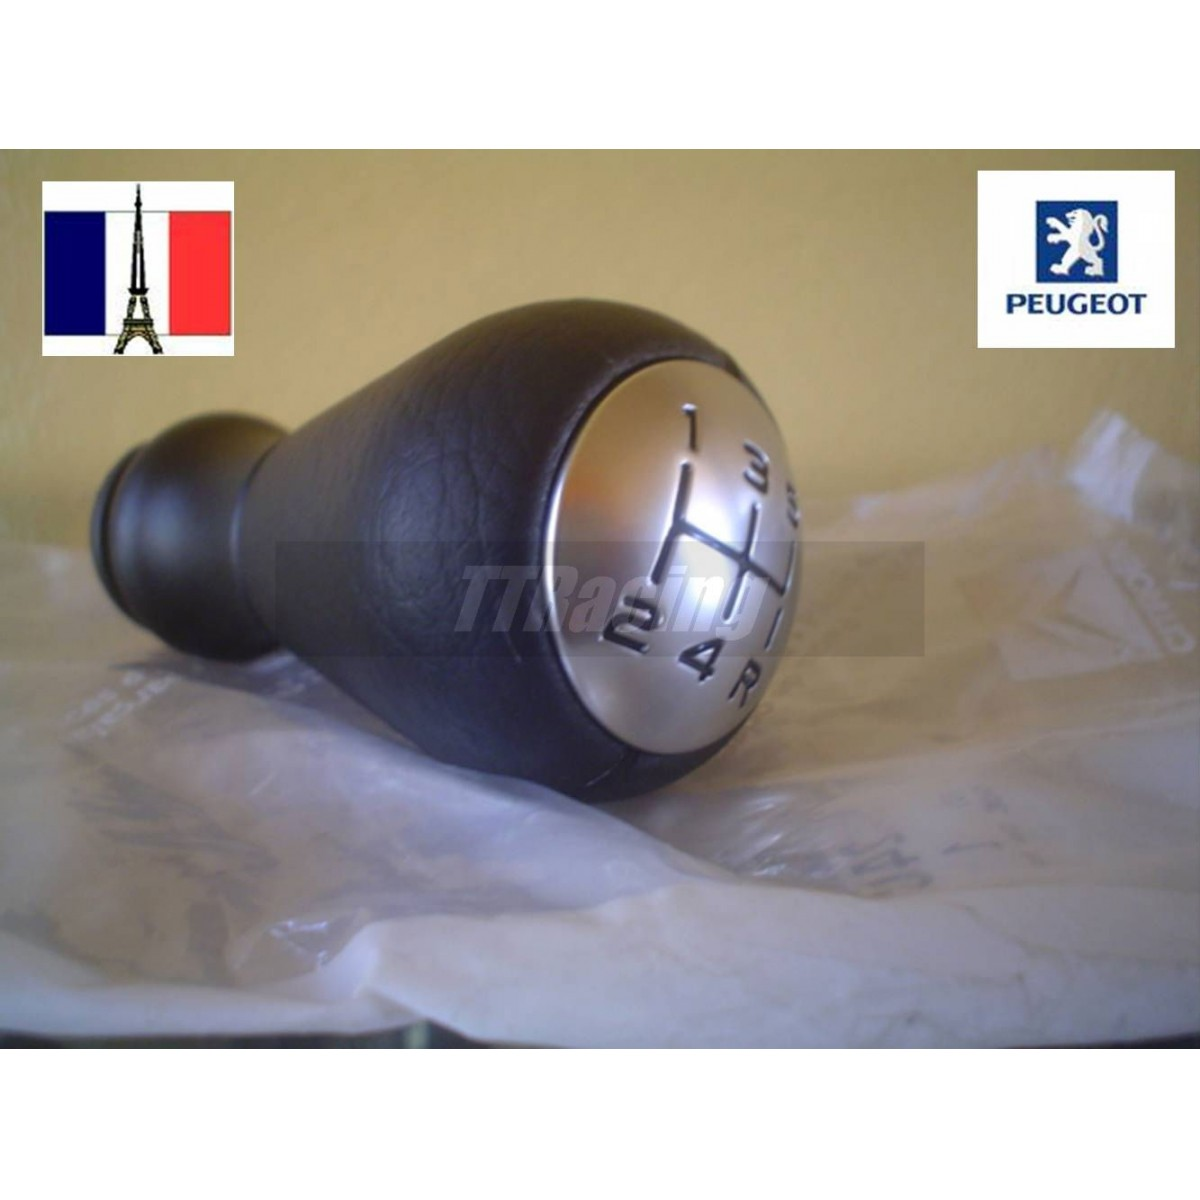 Manopla de câmbio Original Peugeot 206 306 307 207  - T & T Soluções